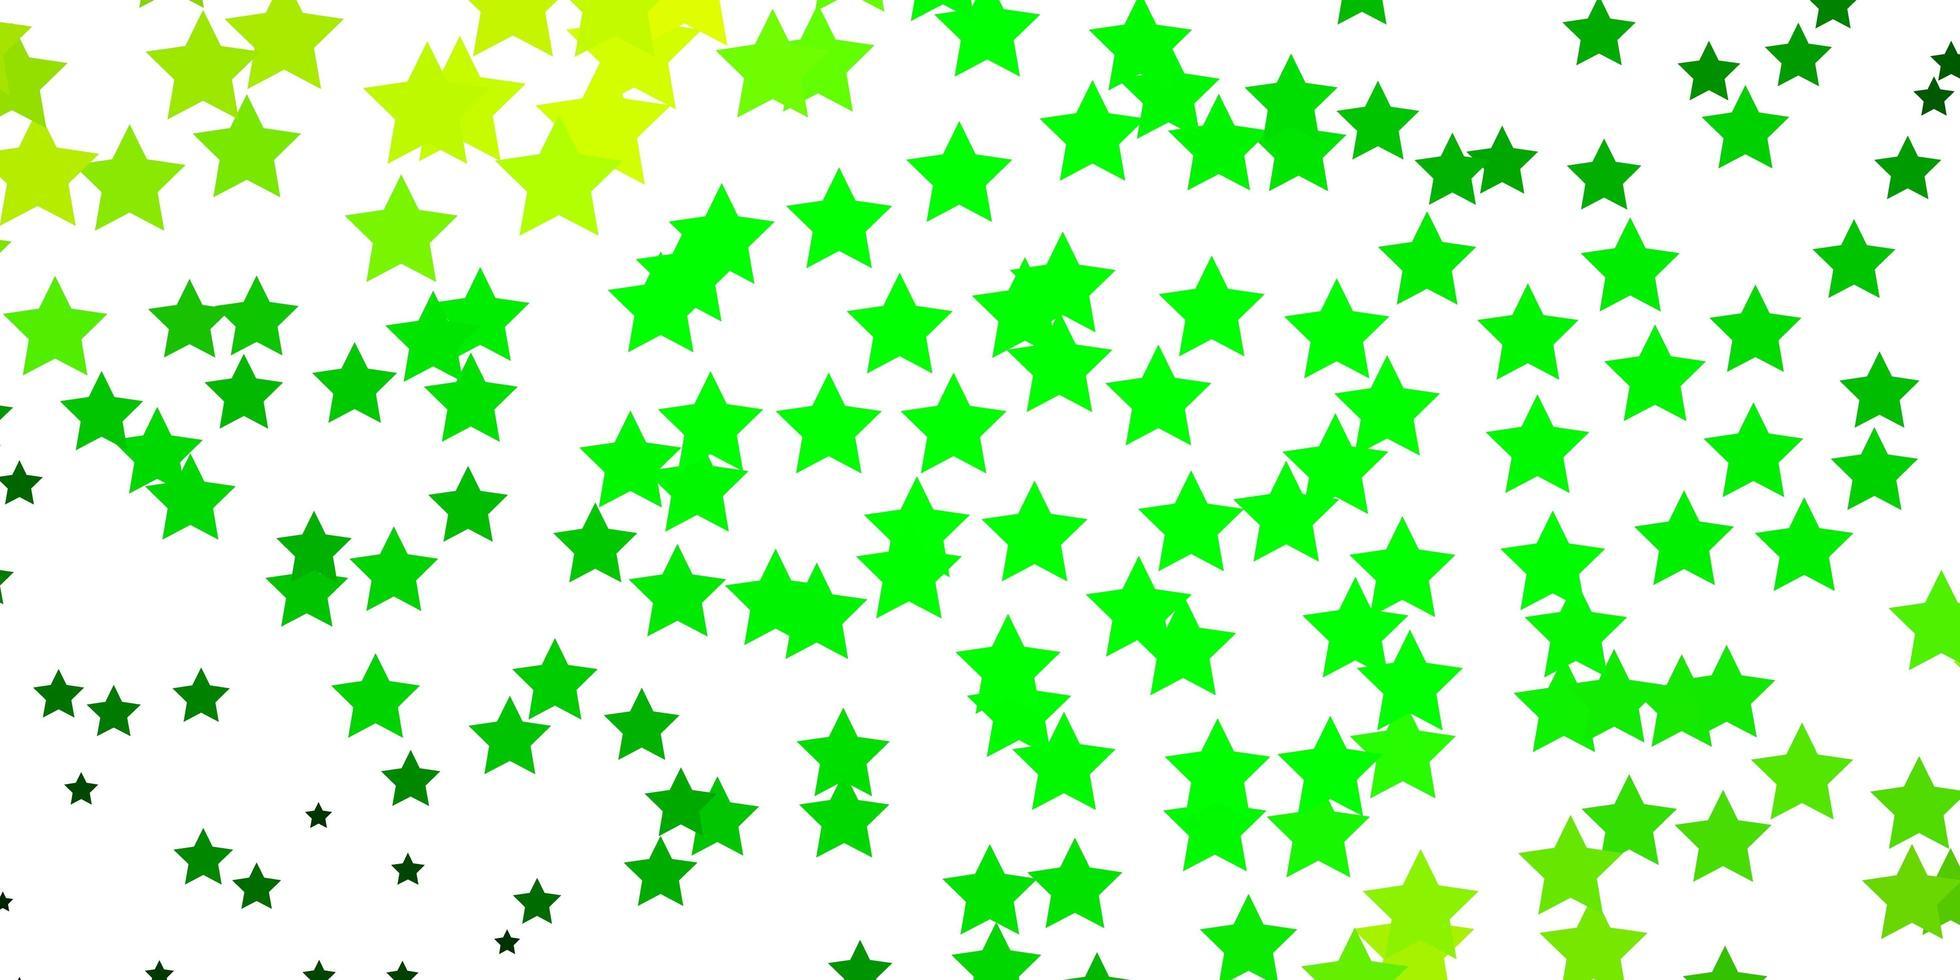 modelo de vetor azul escuro e verde com estrelas de néon.